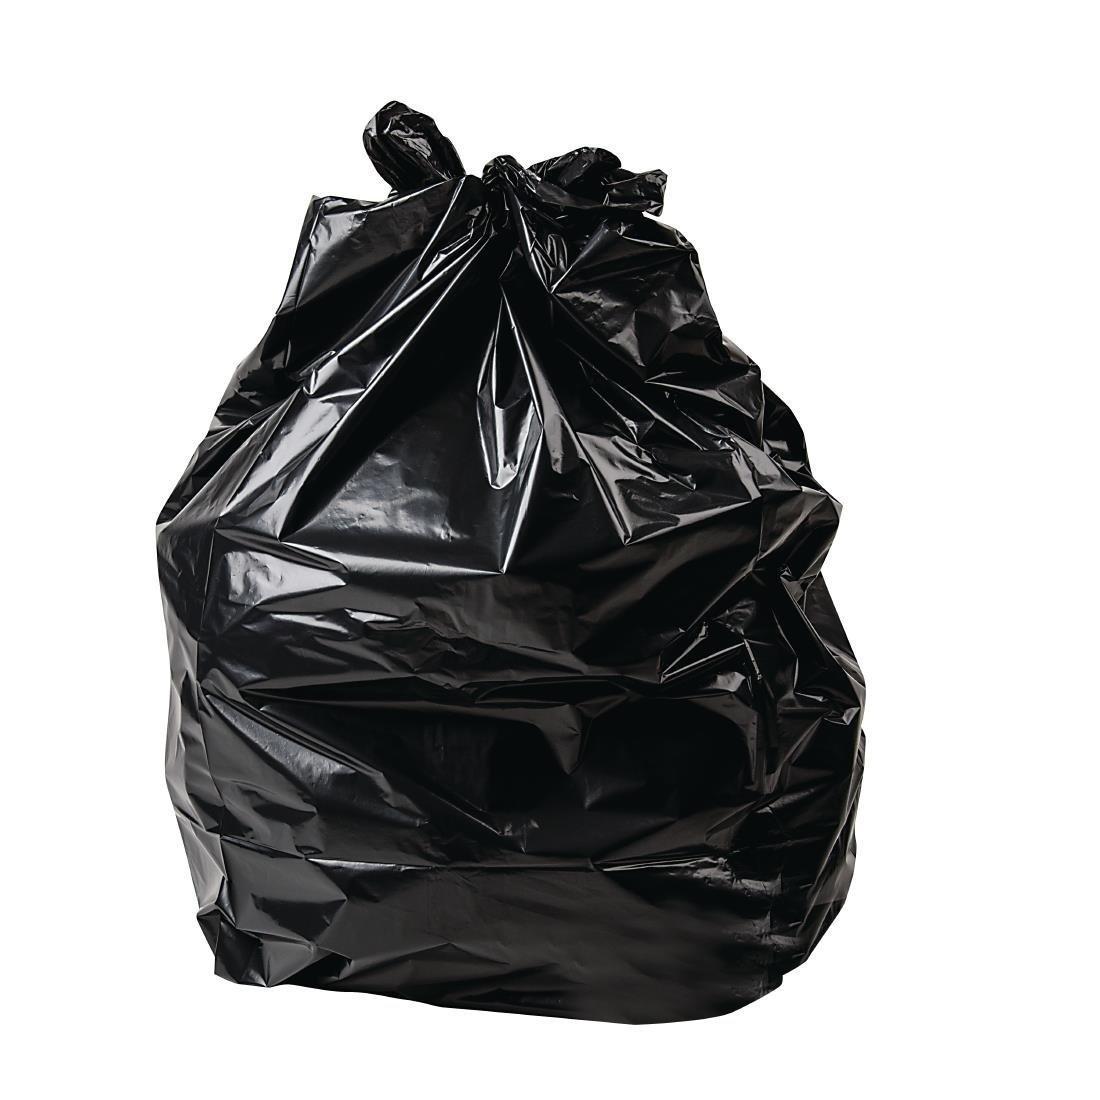 54L GARBAGE BAGS BLACK, BOX 250